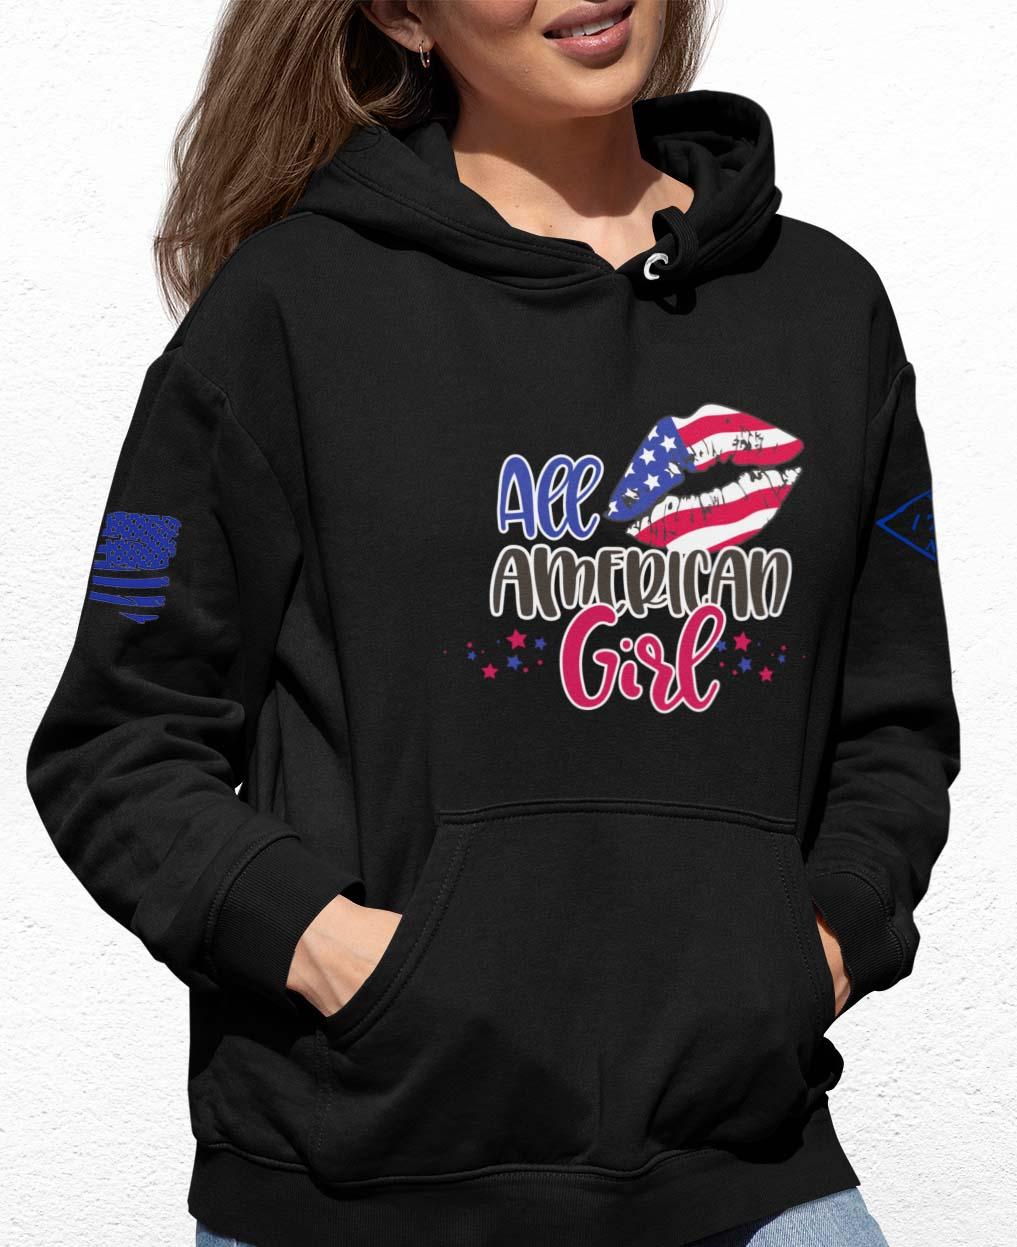 All American Girl on a black hoodie